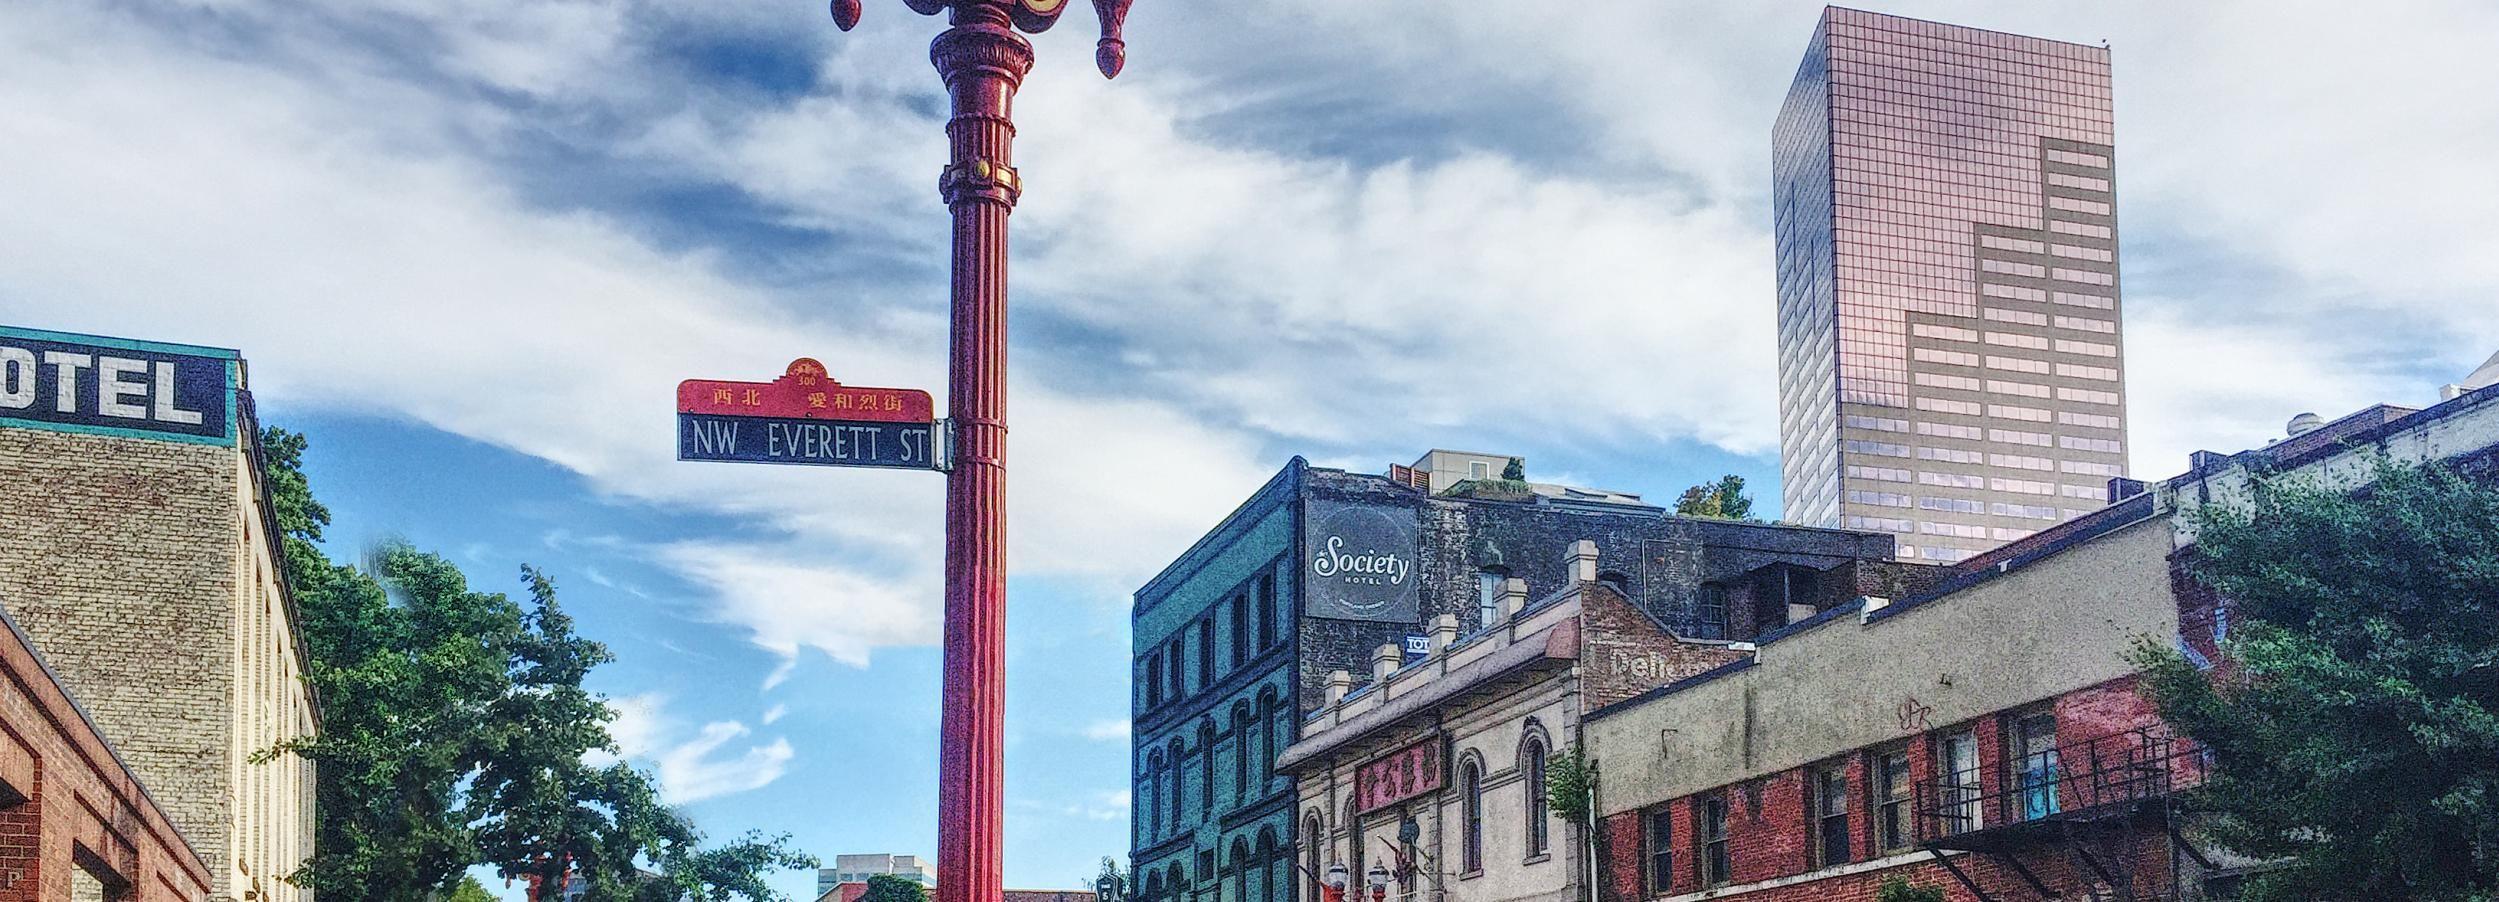 Bike Portland: Bridges, Doughnuts, Parks and Roses